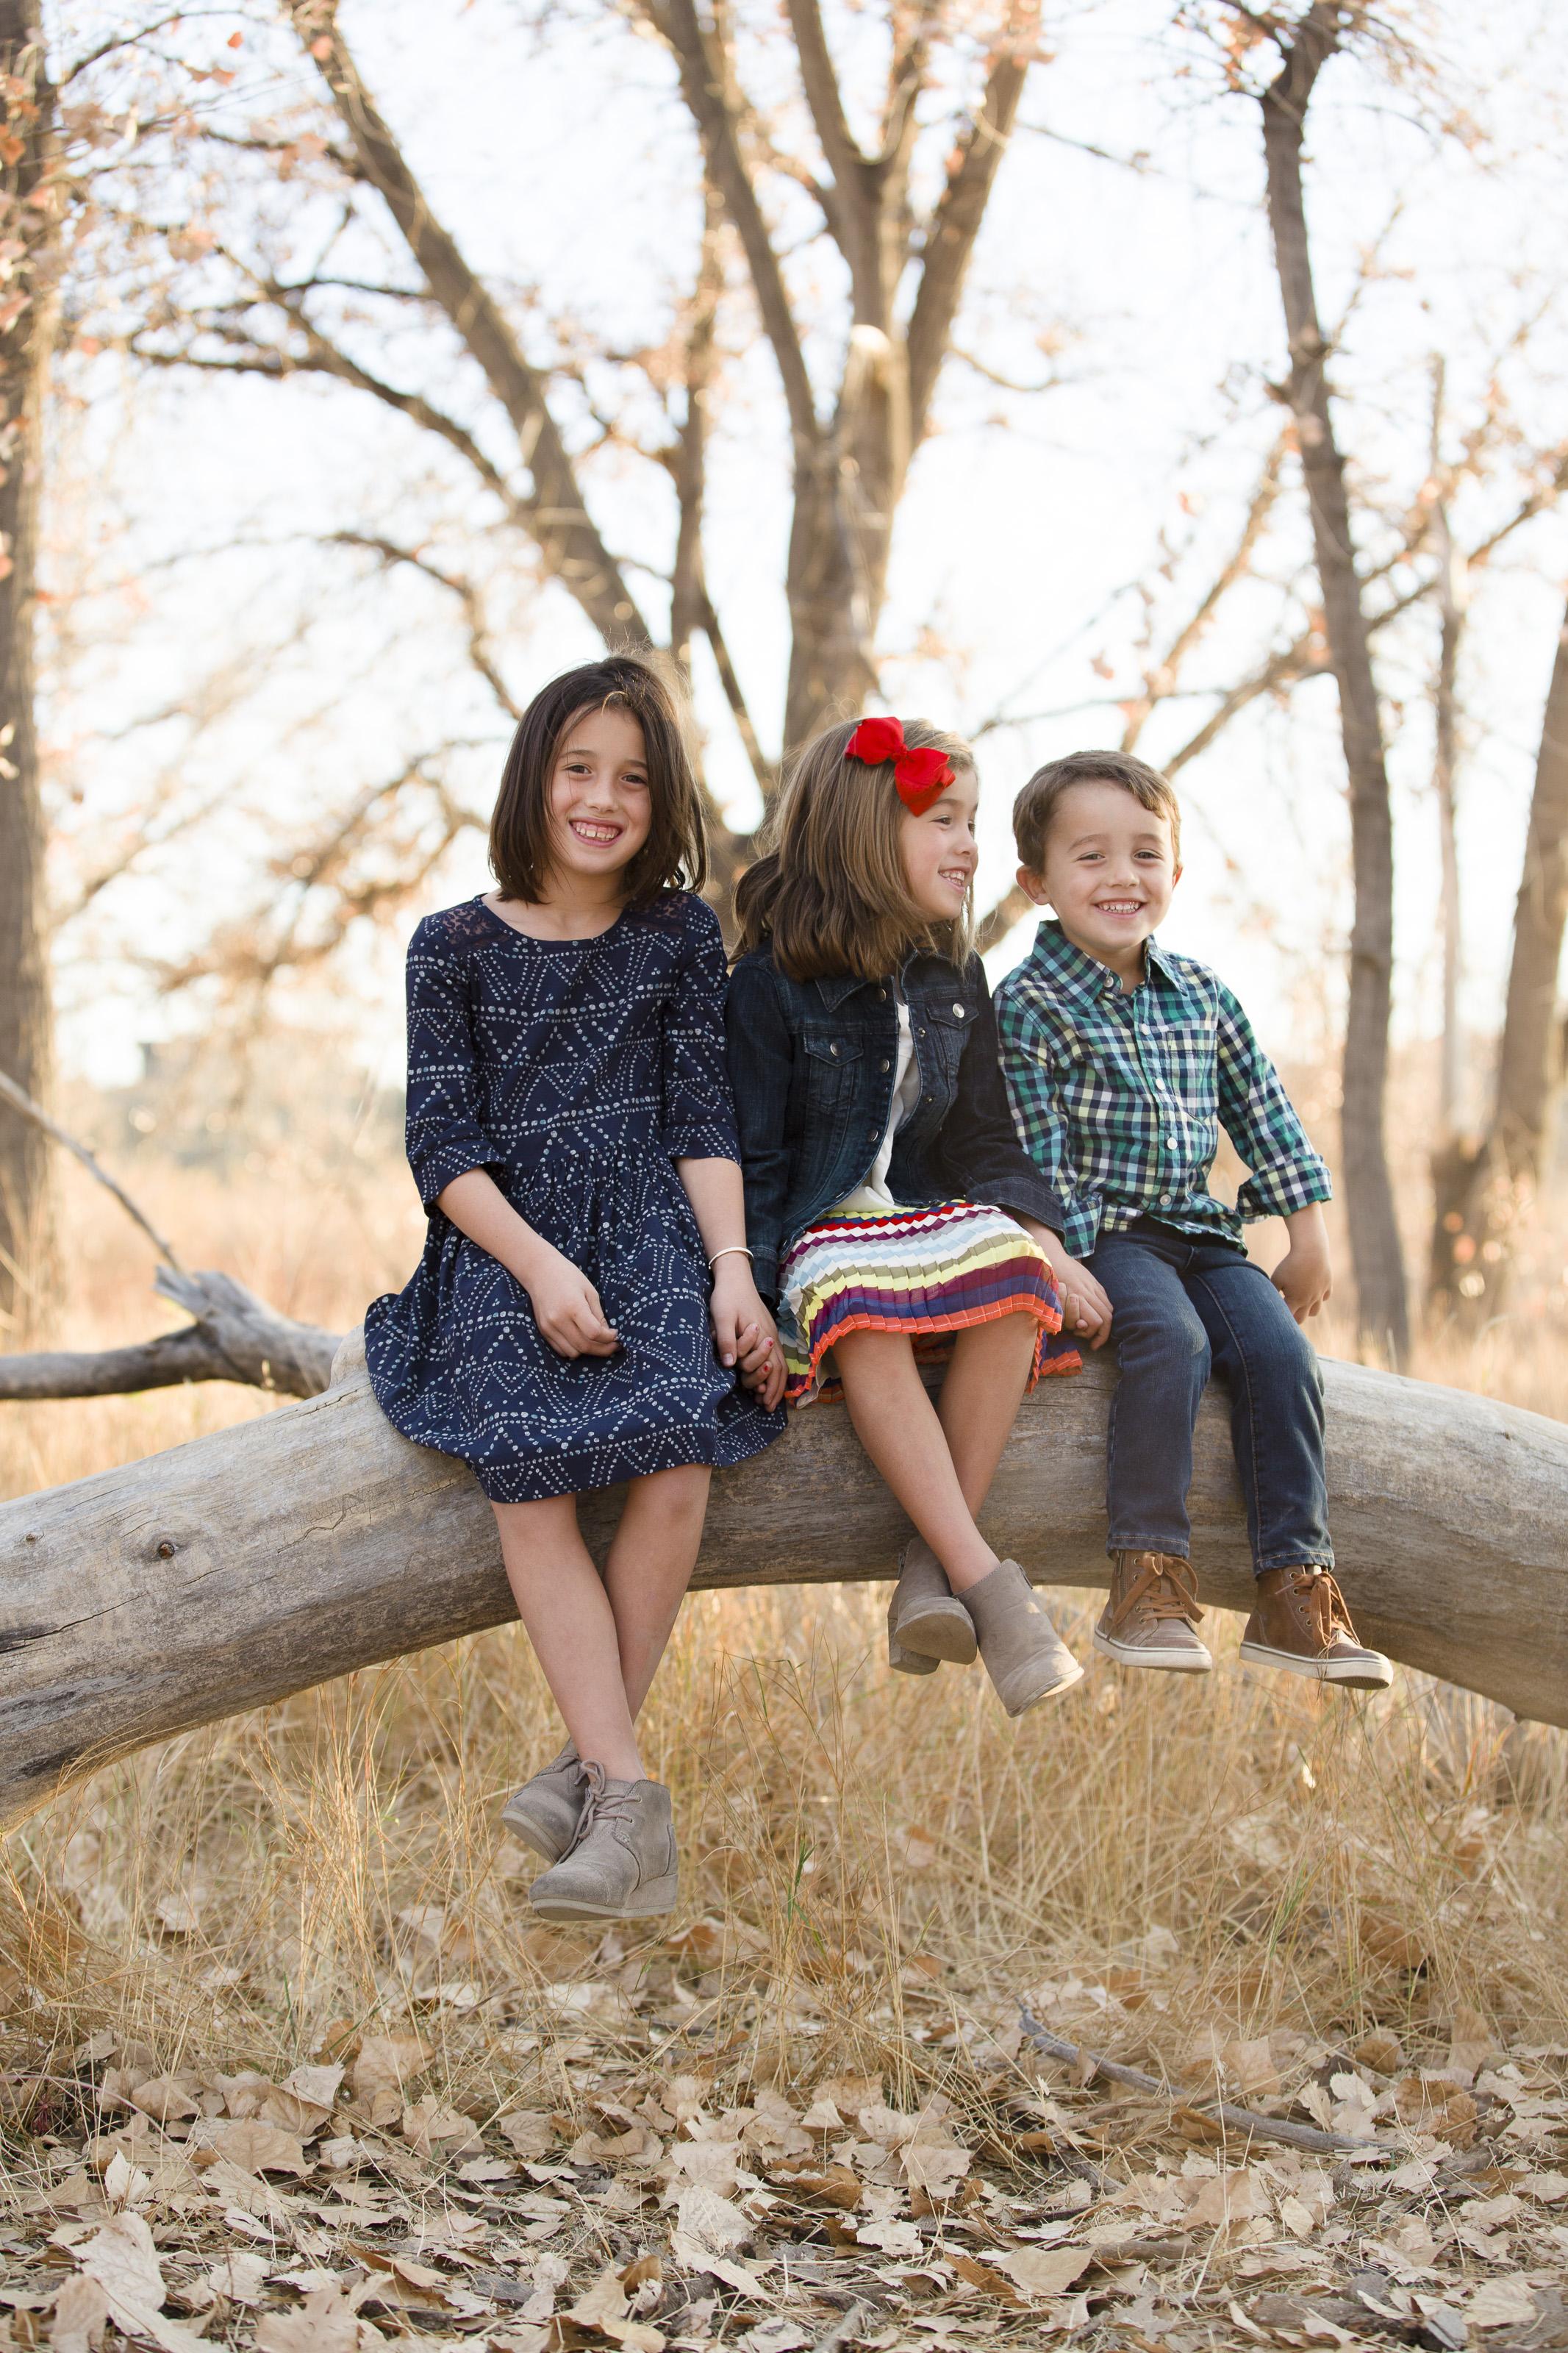 kristen-vance-stapleton-colorado-kids-2.jpg